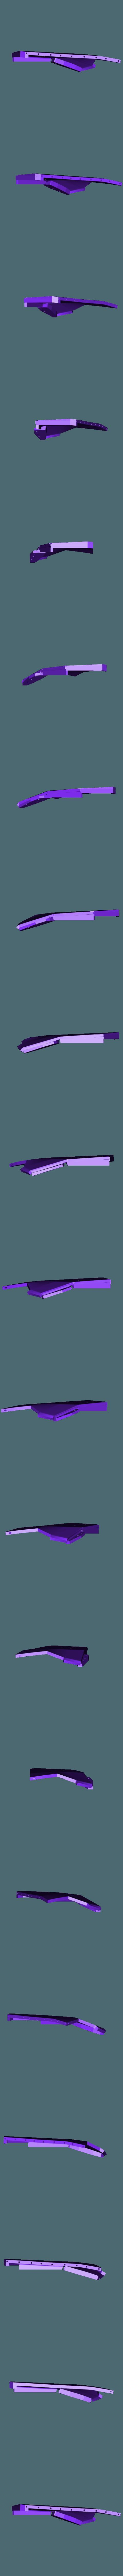 Left side 1.stl Download STL file Iron Man Mark 42  • 3D printing object, SKUPERDIY